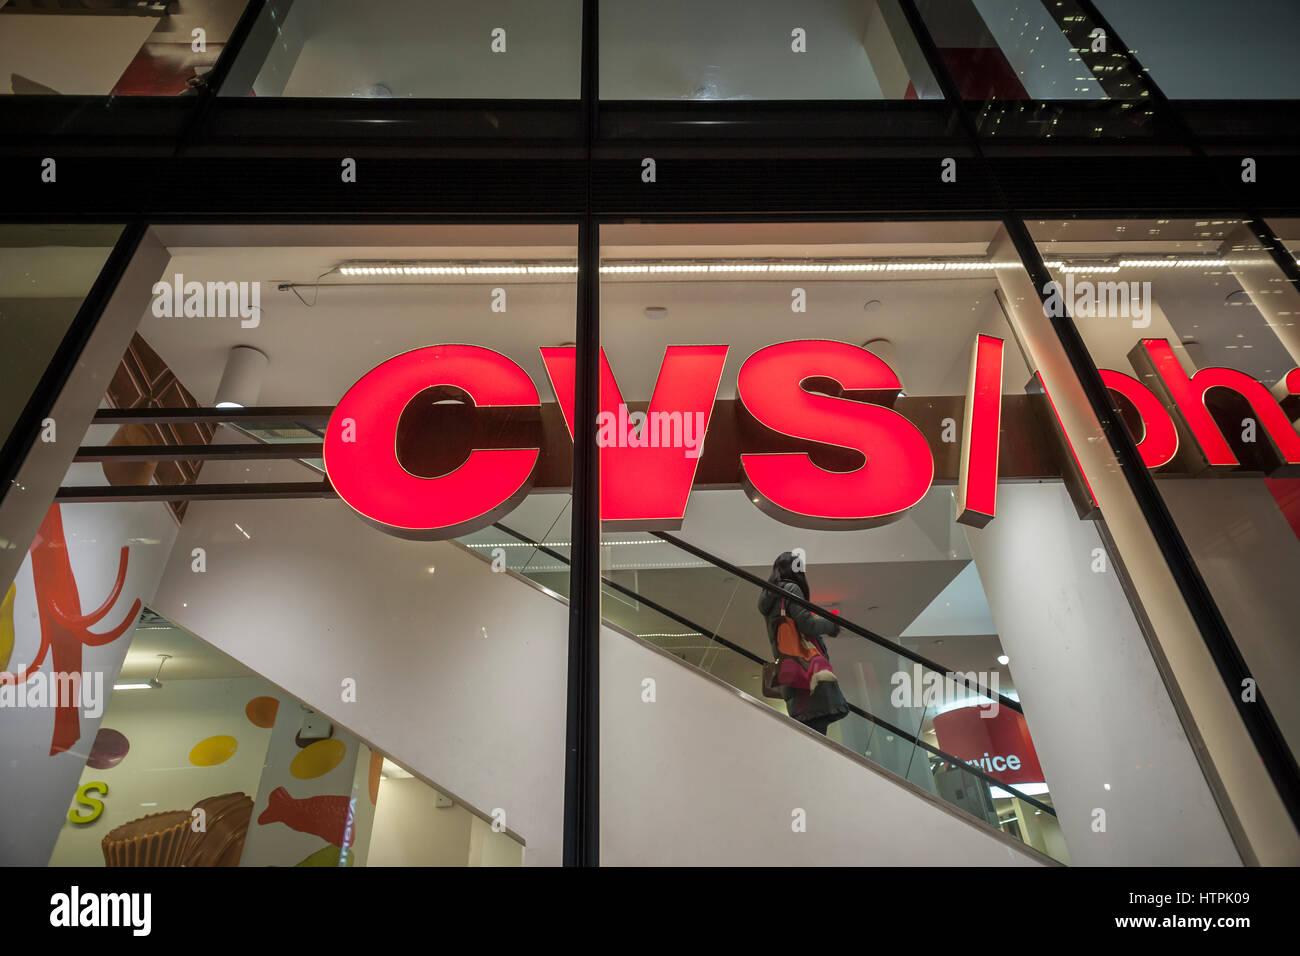 Cvs Health Stock Photos Cvs Health Stock Images Alamy